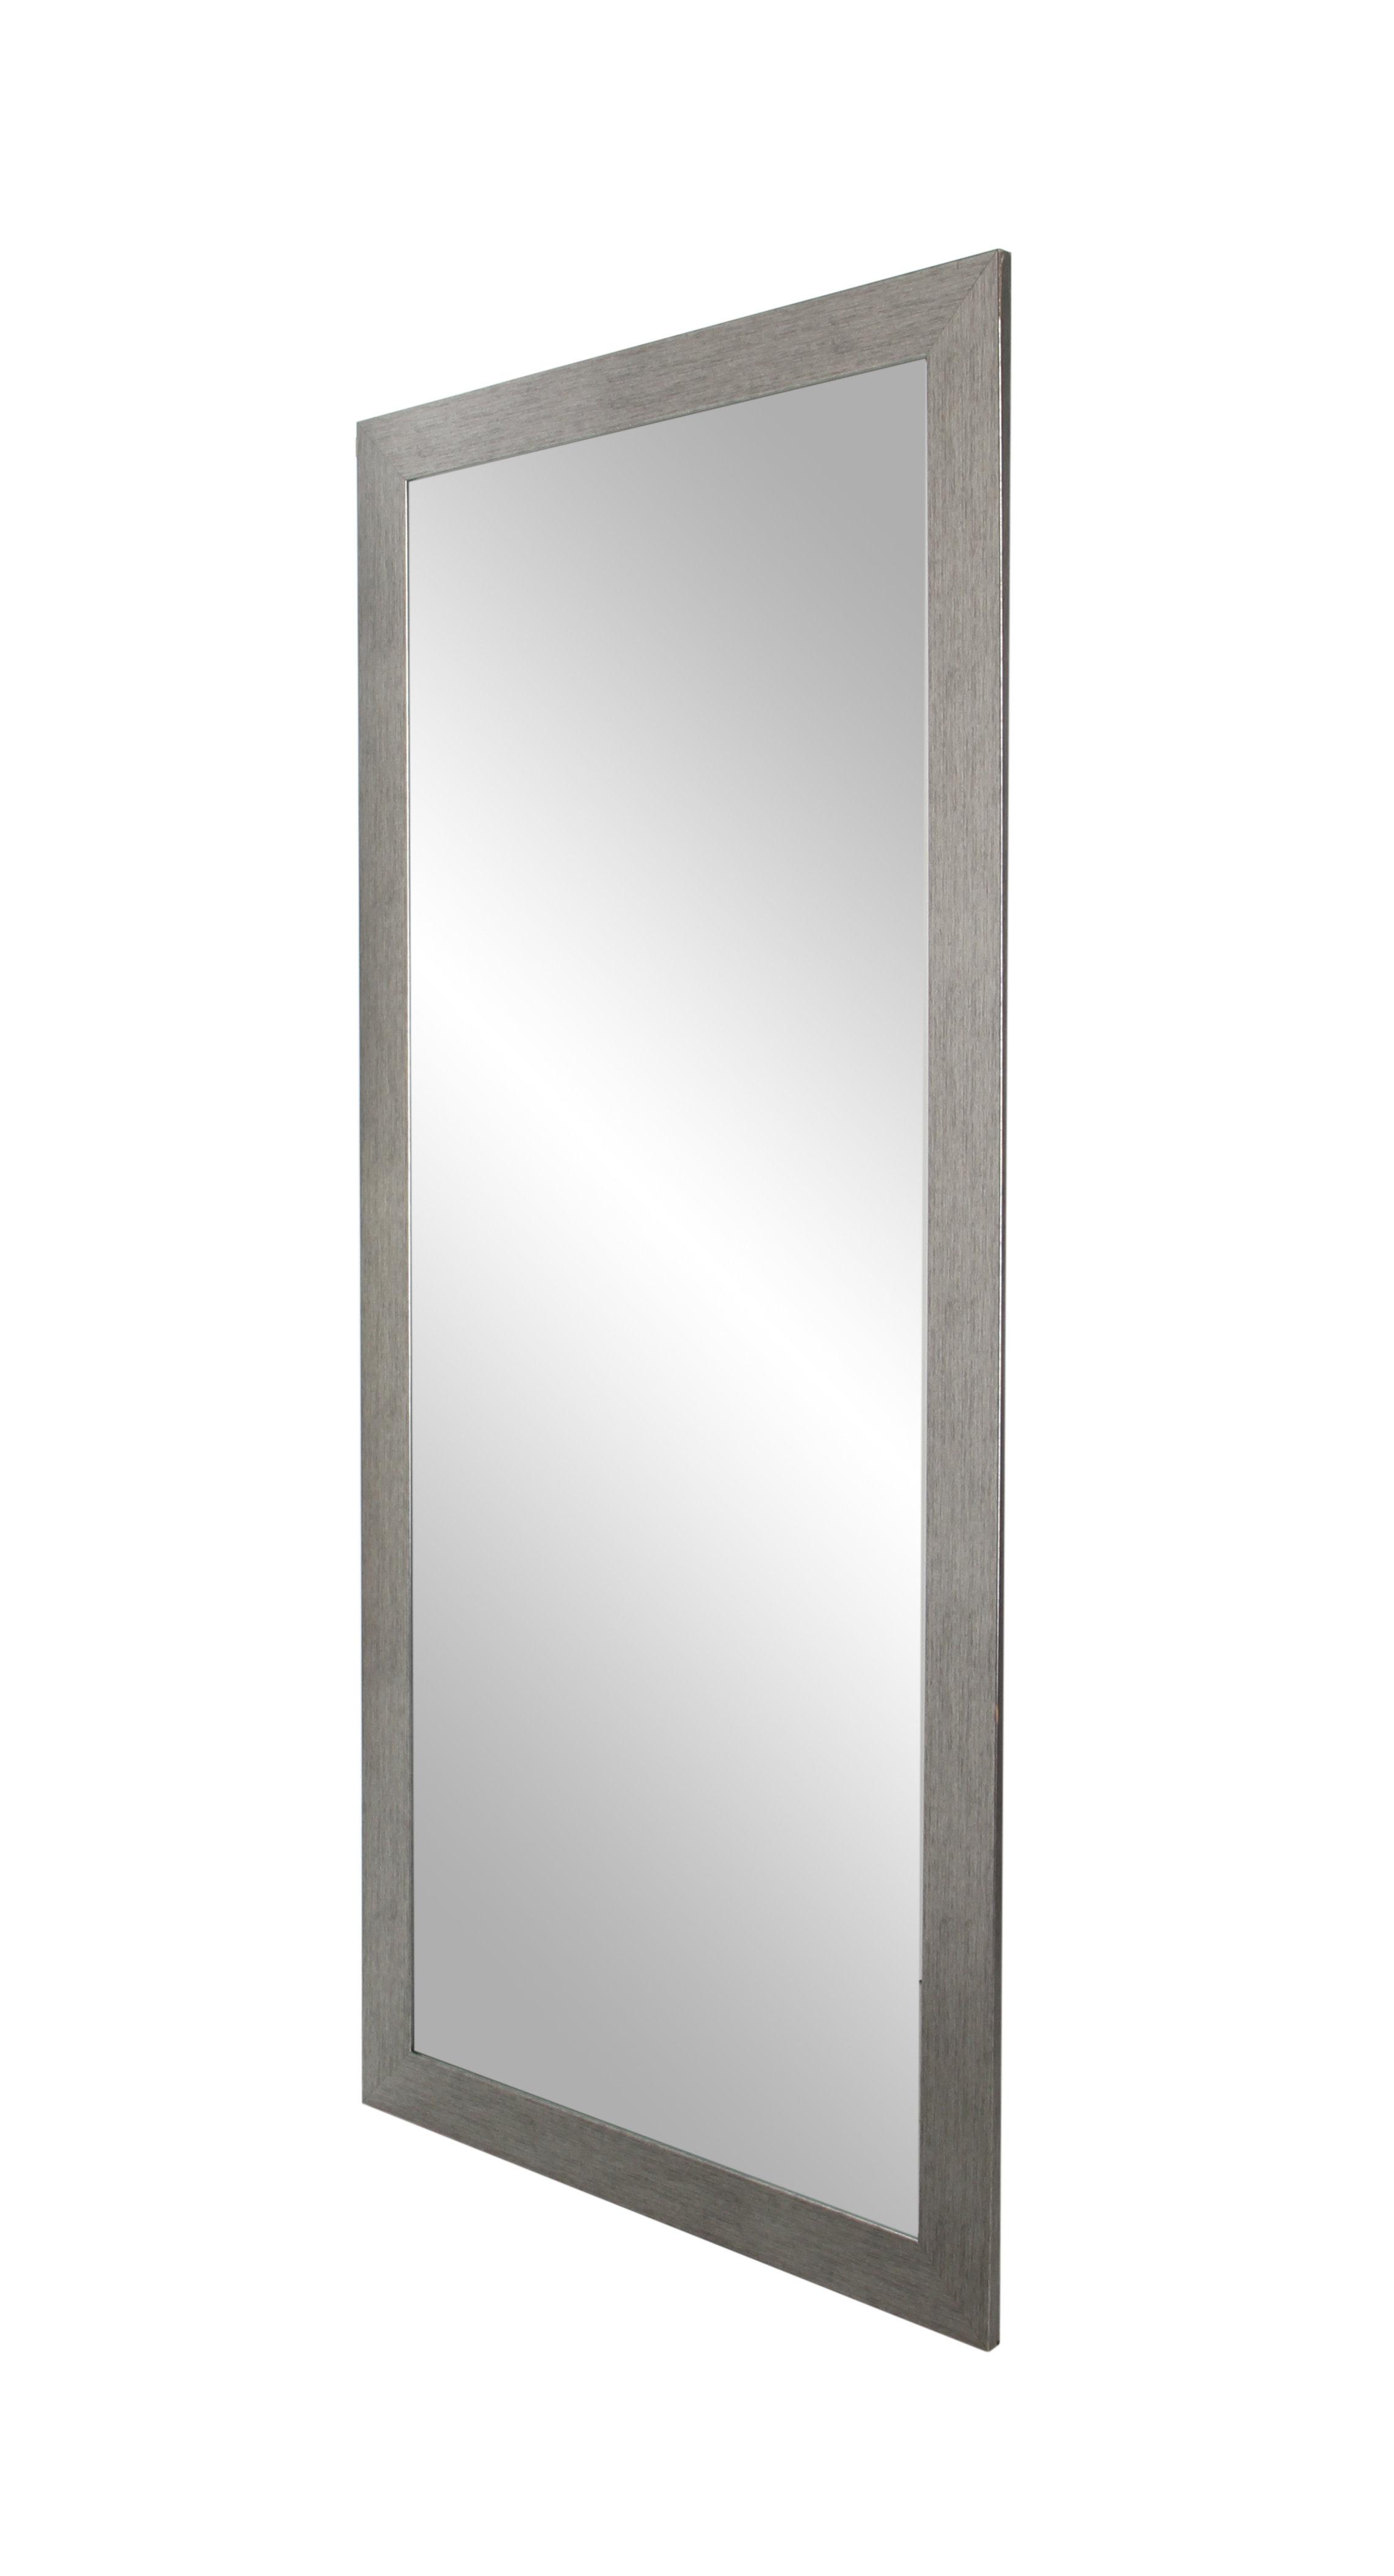 Giannone Grain Full Modern & Contemporary Length Mirror In Sartain Modern & Contemporary Wall Mirrors (View 19 of 20)